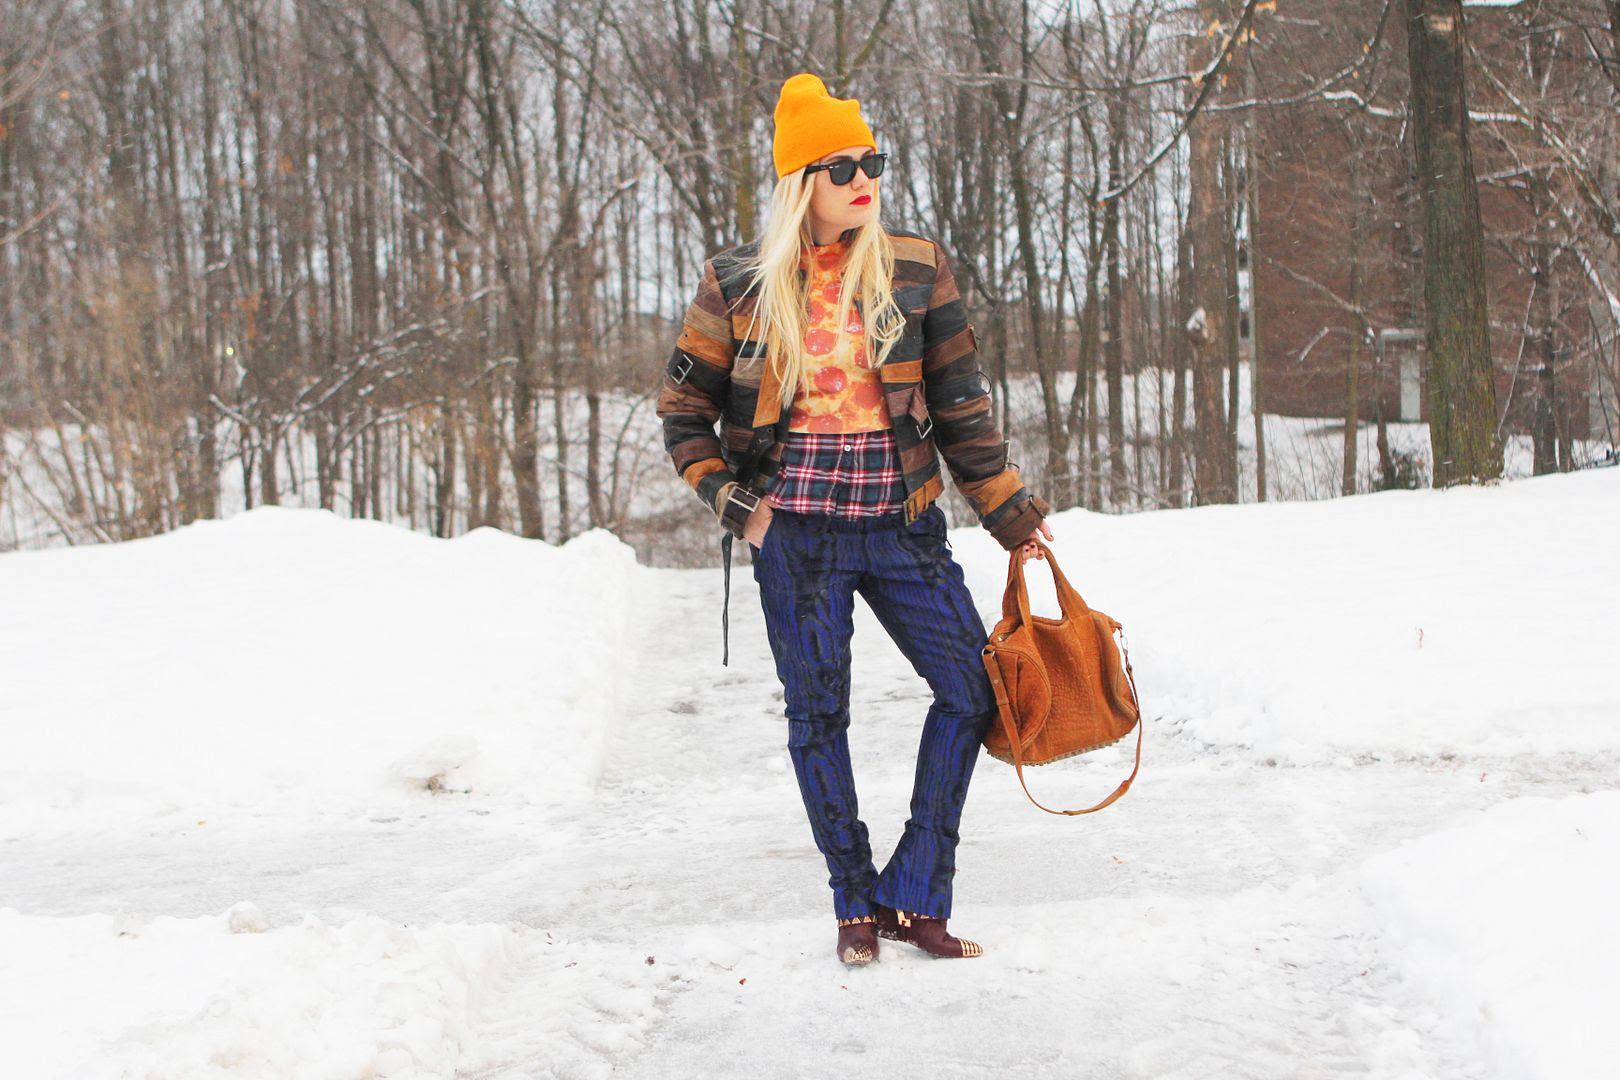 photo sam-beckerman-toronto-fashion-sunglasses-ivy-kirzhner_zpsfac690f1.jpg